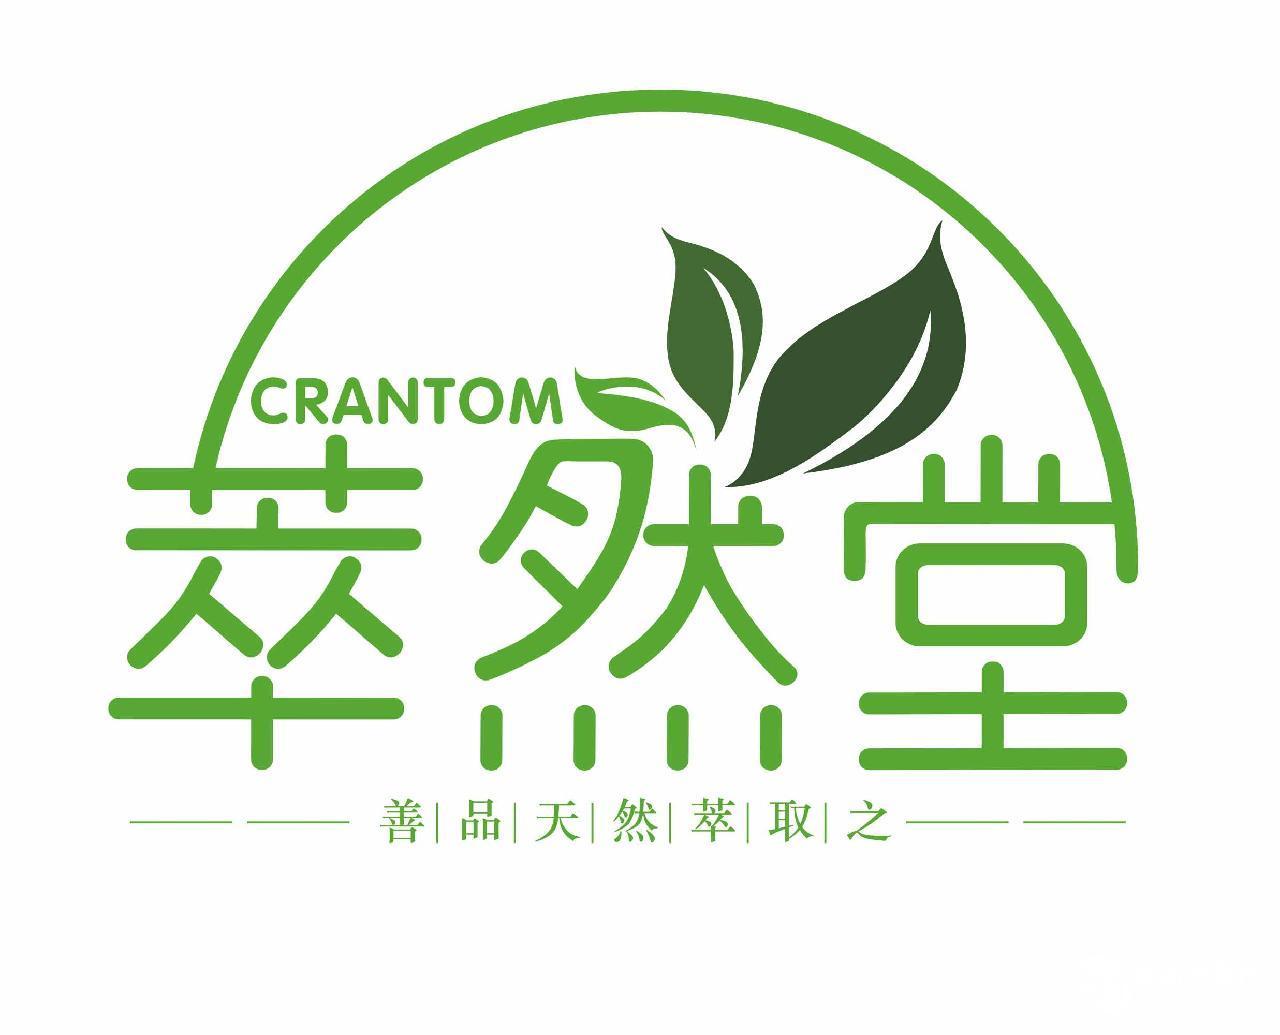 logo logo 标志 设计 图标 1280_1035